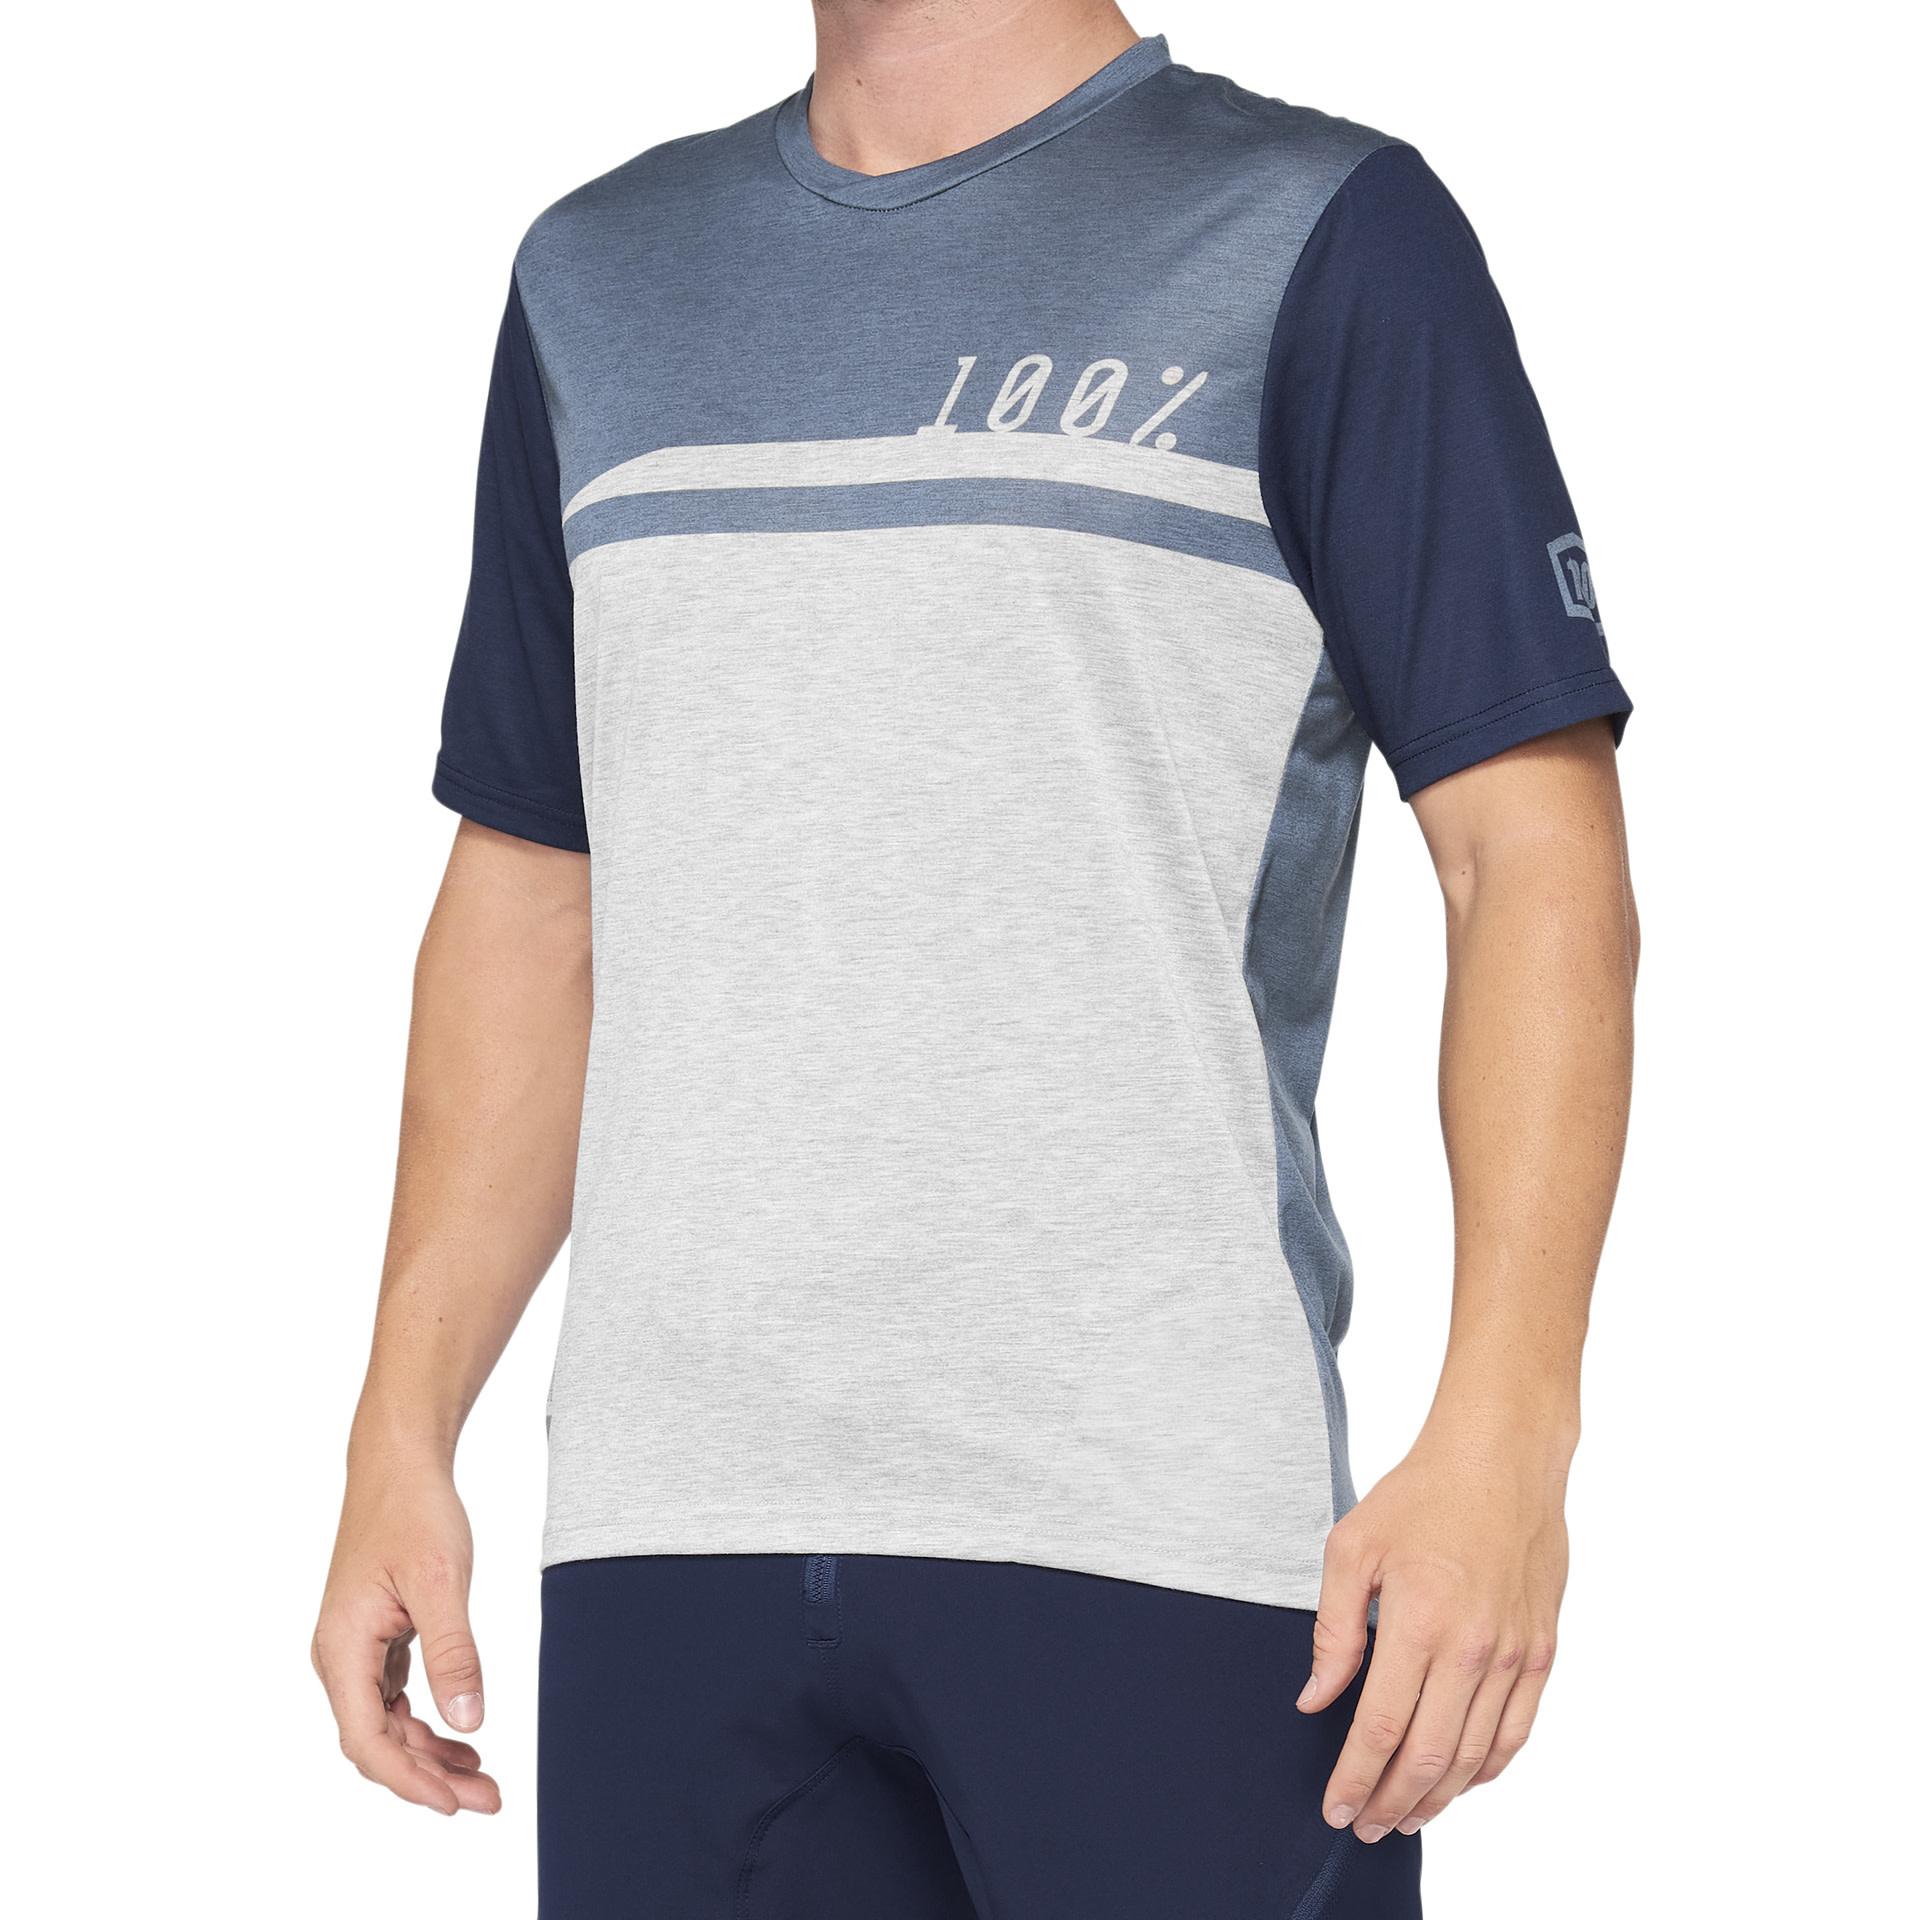 100% Airmatic Jersey Steel Blue / Grey-1